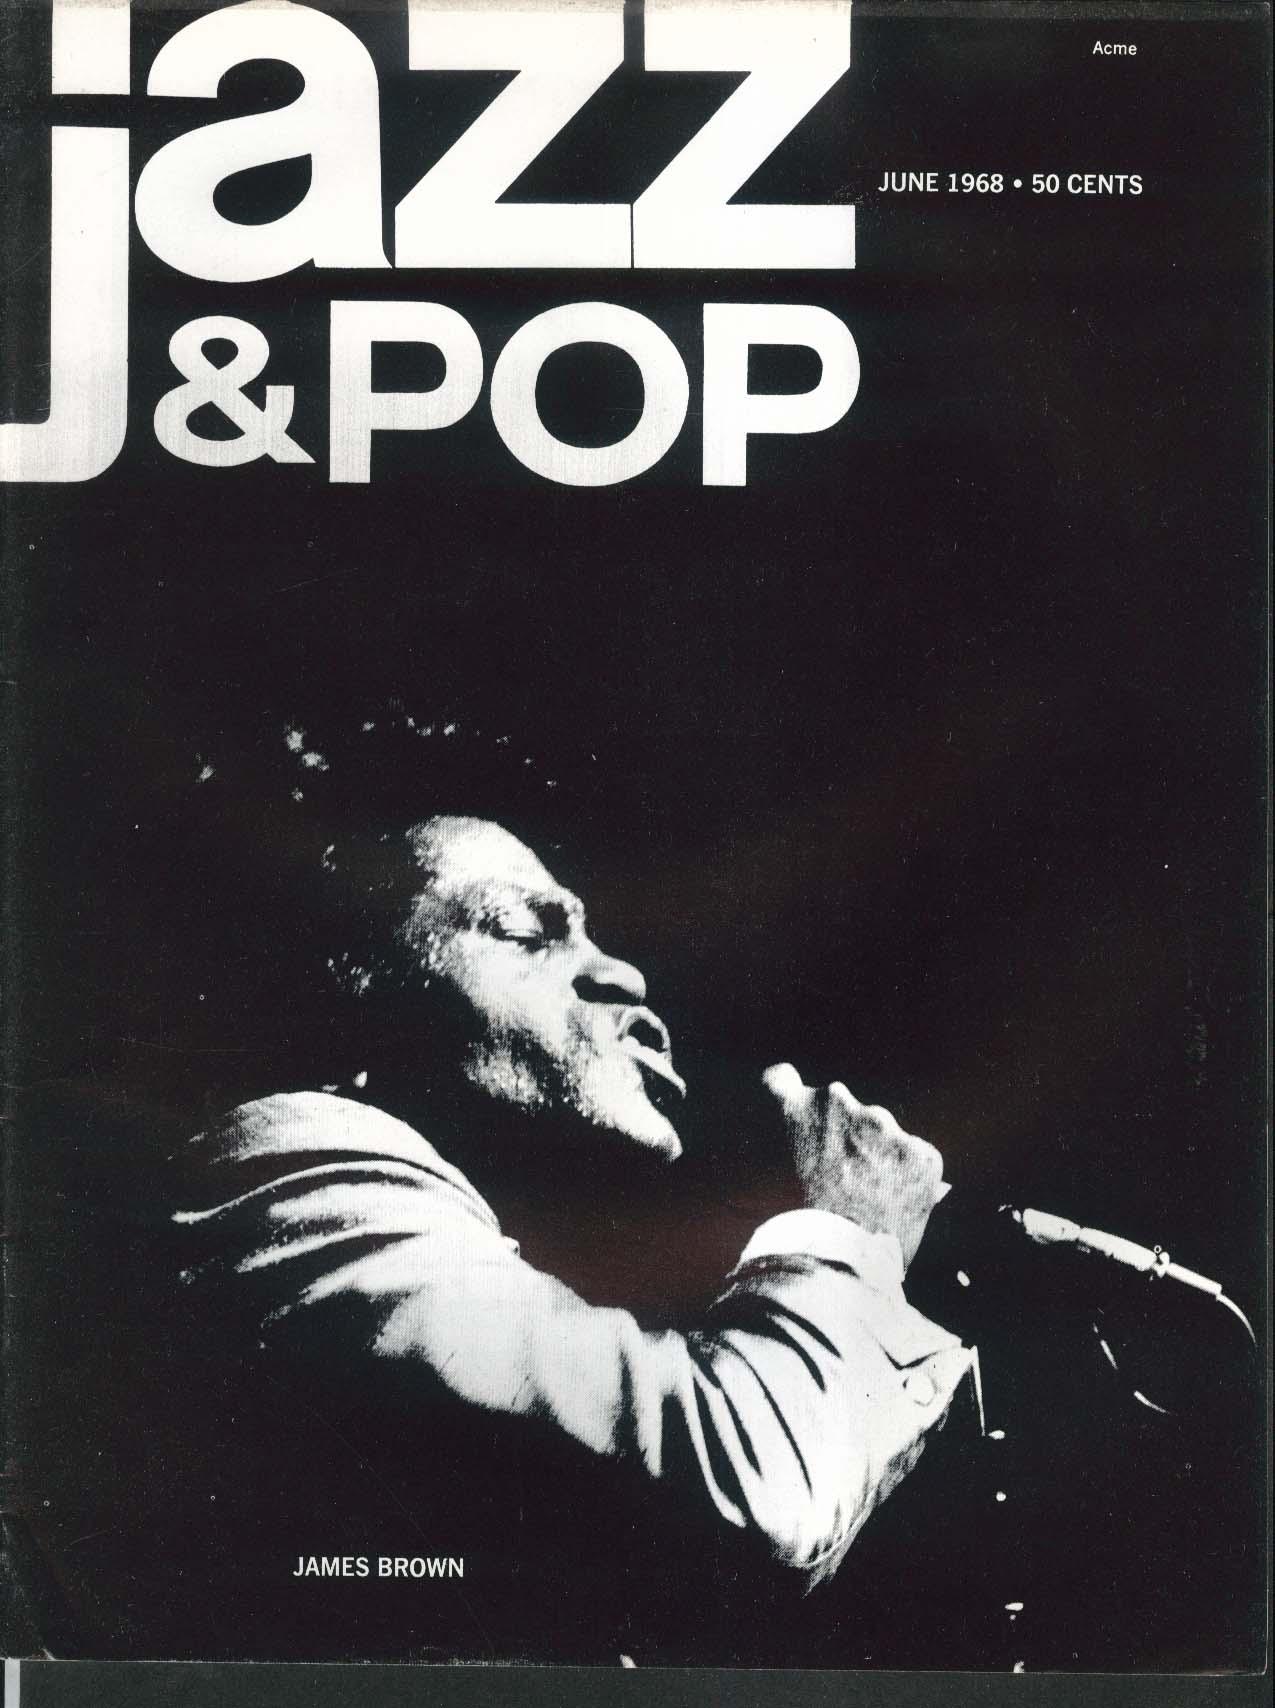 JAZZ & POP James Brown Archie Stepp Transcendental Meditation 6 1968